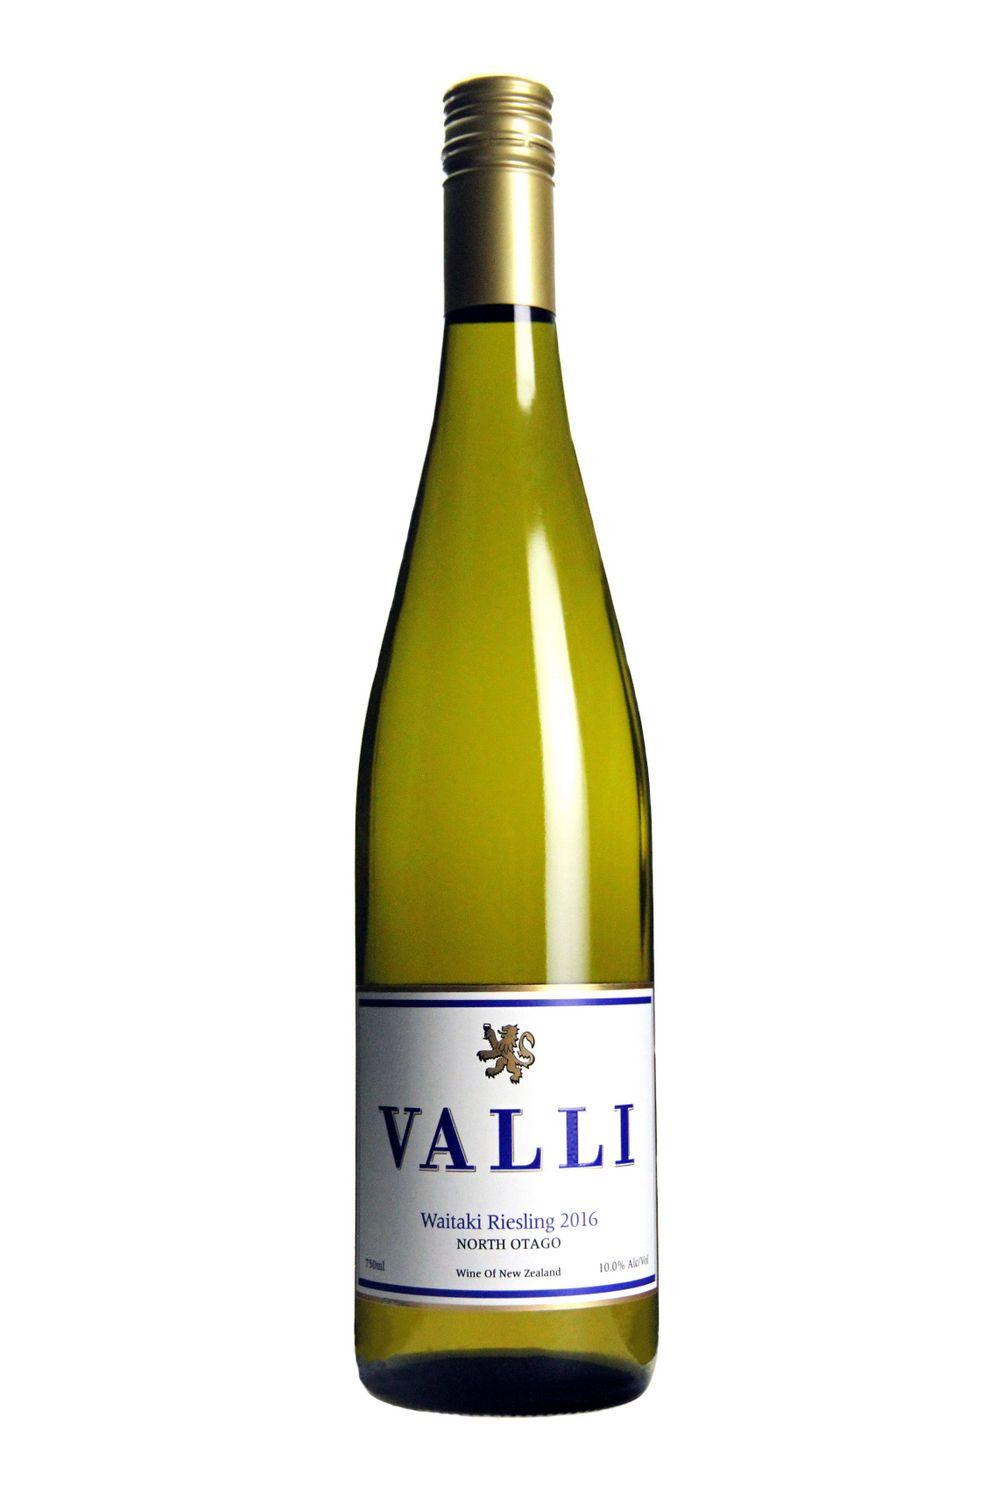 Valli Waitaki Riesling 2016